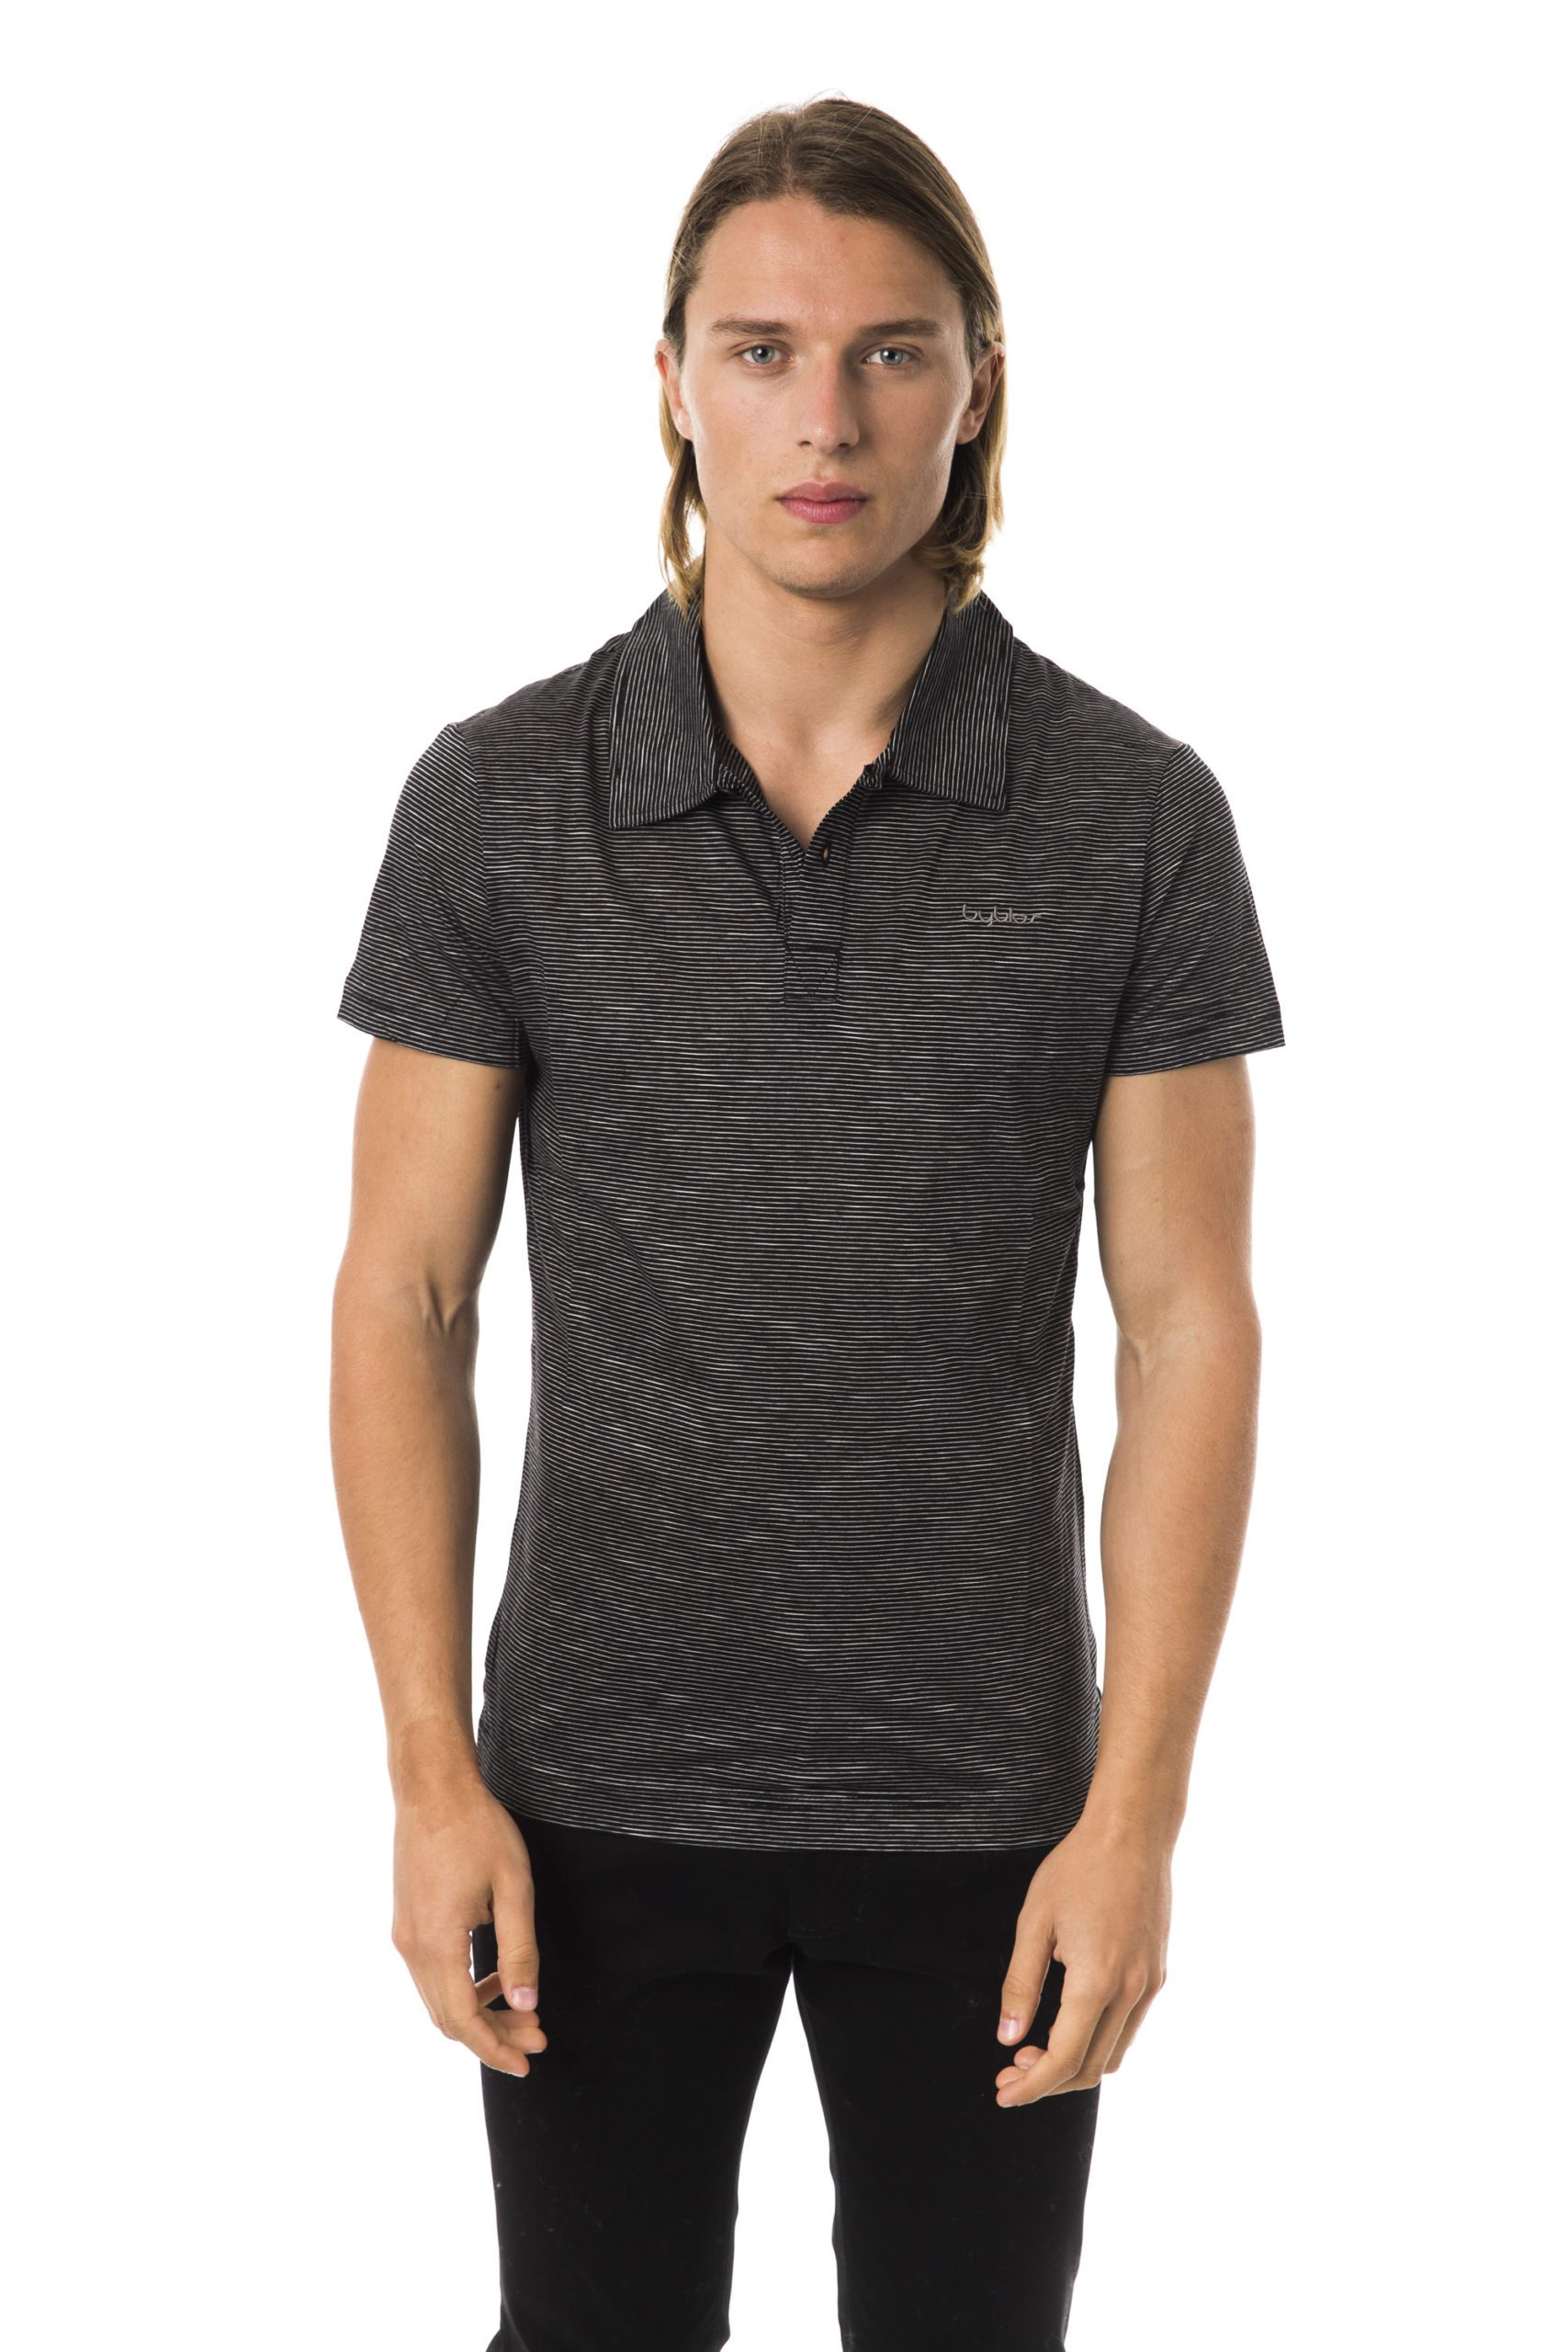 Byblos Men's Polo Shirt Black BY997166 - L